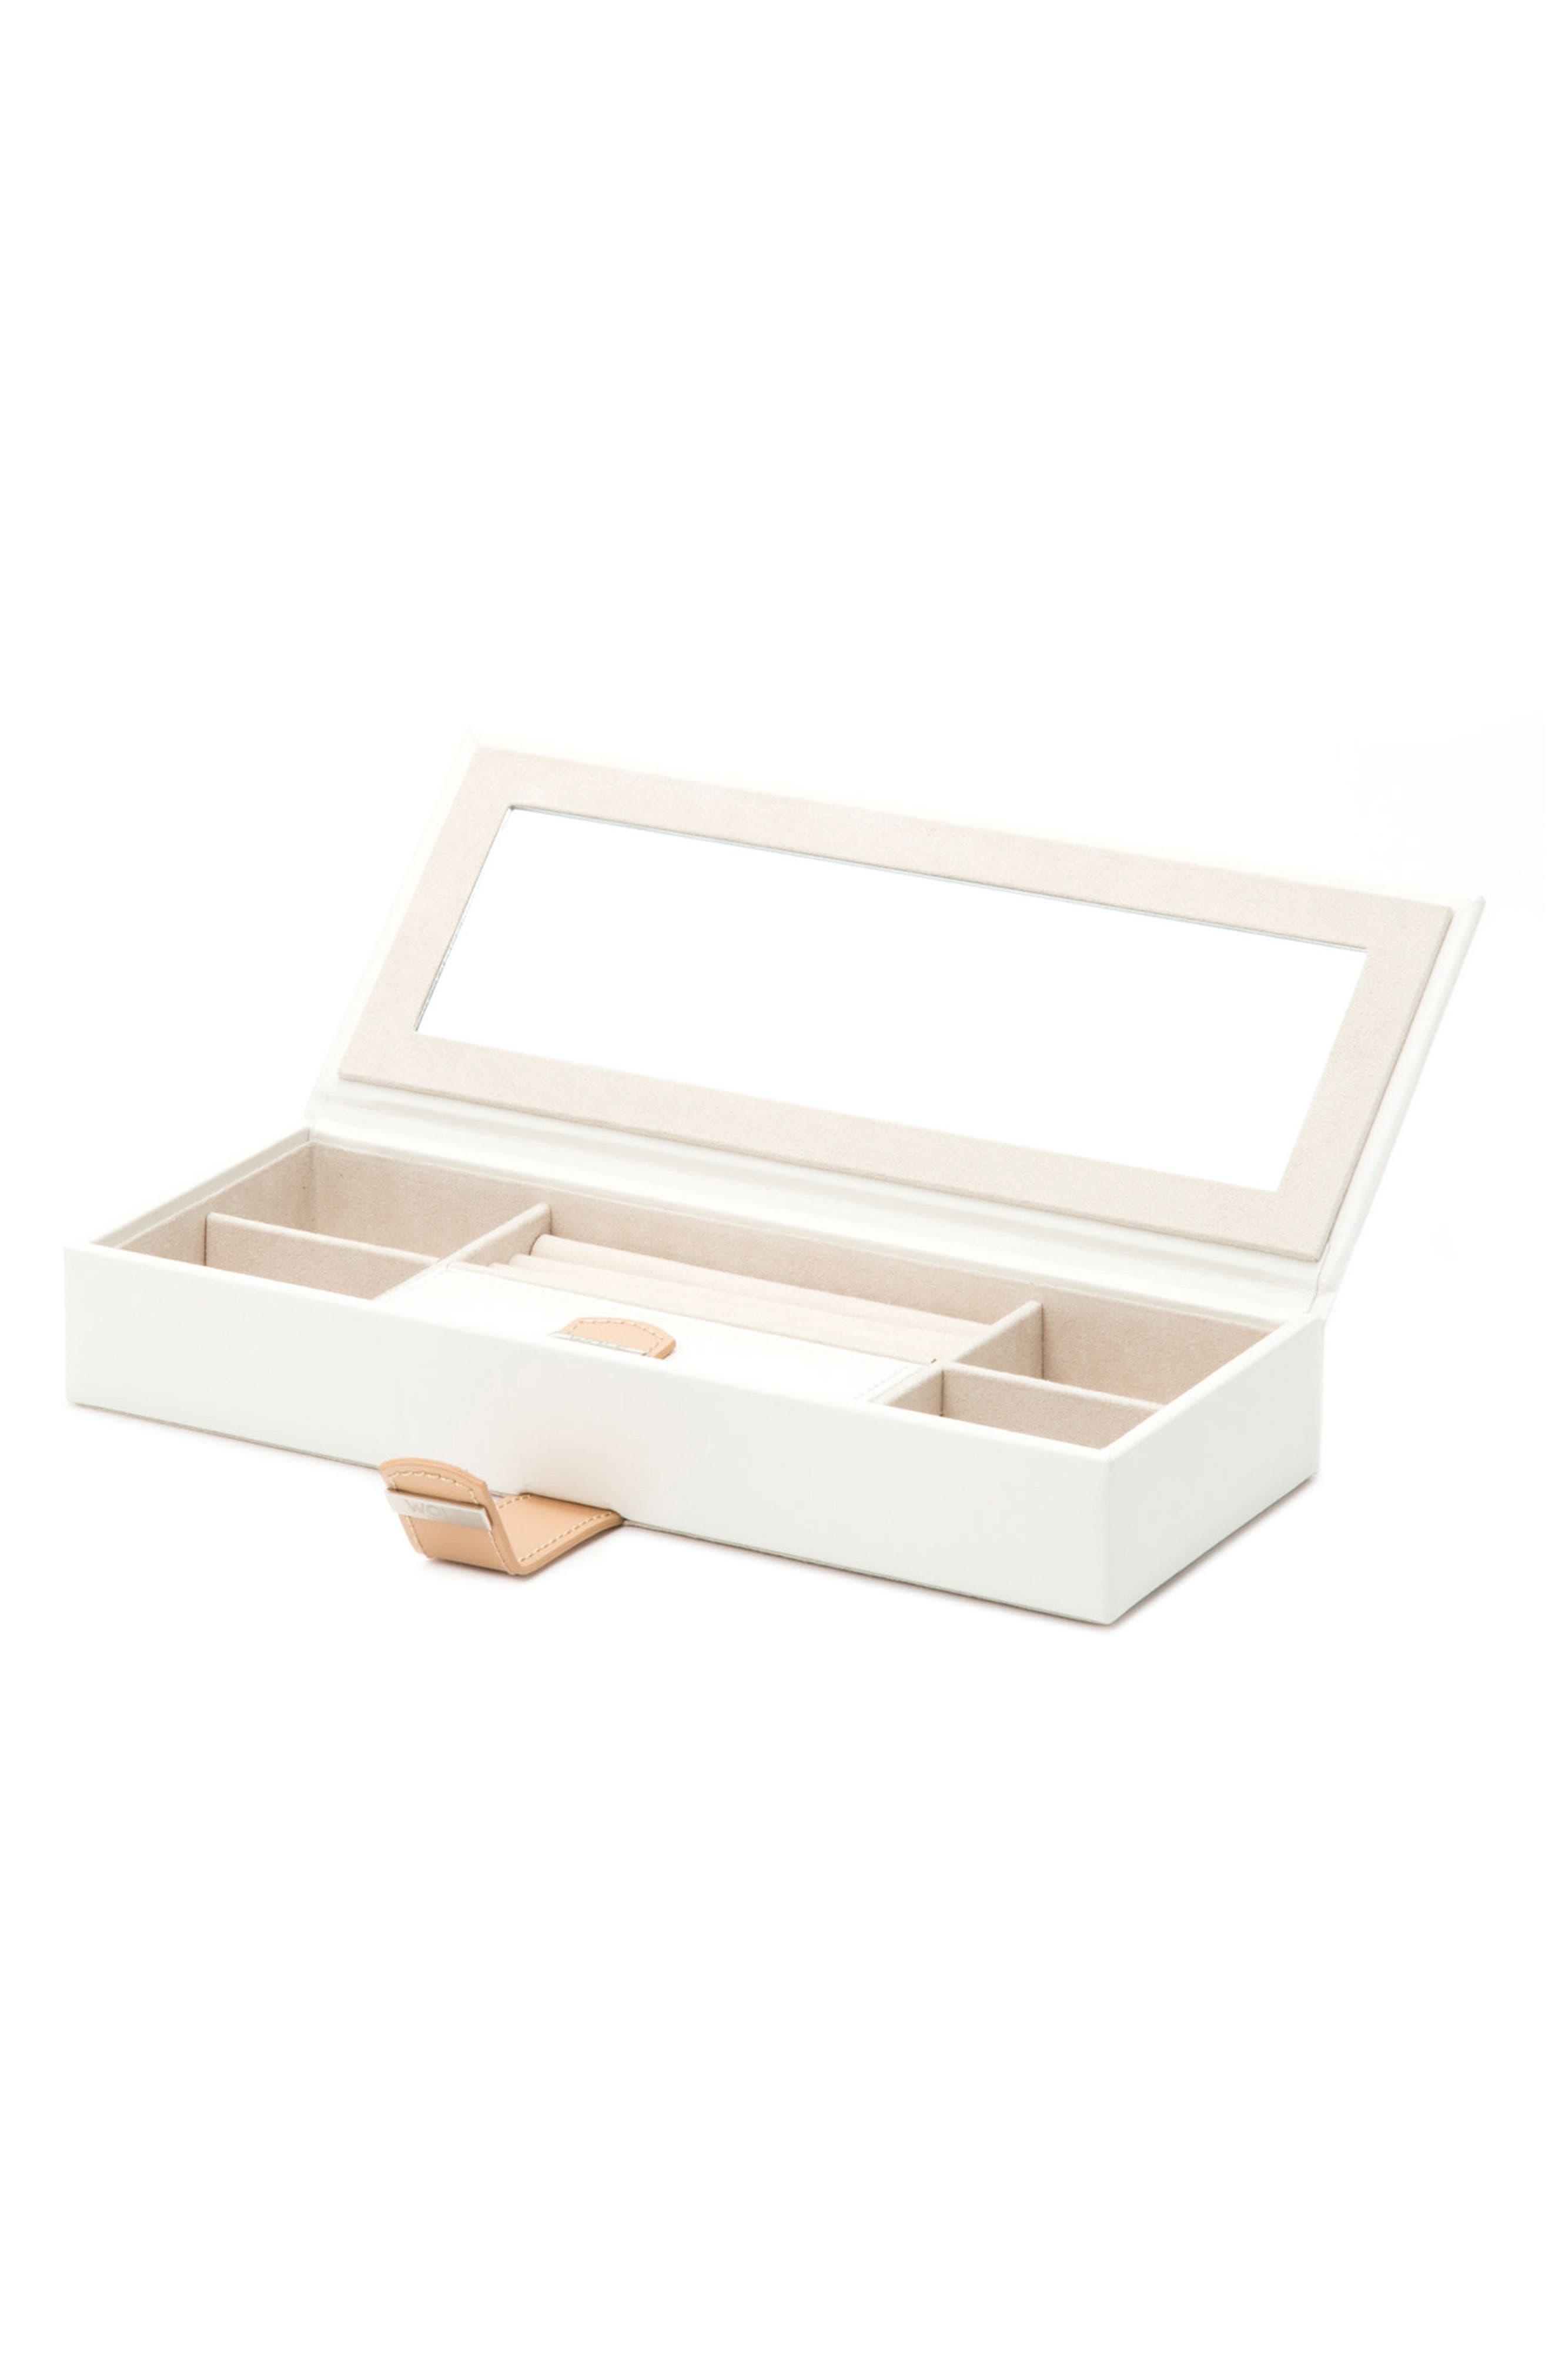 Main Image - Wolf Blossom Jewelry Box